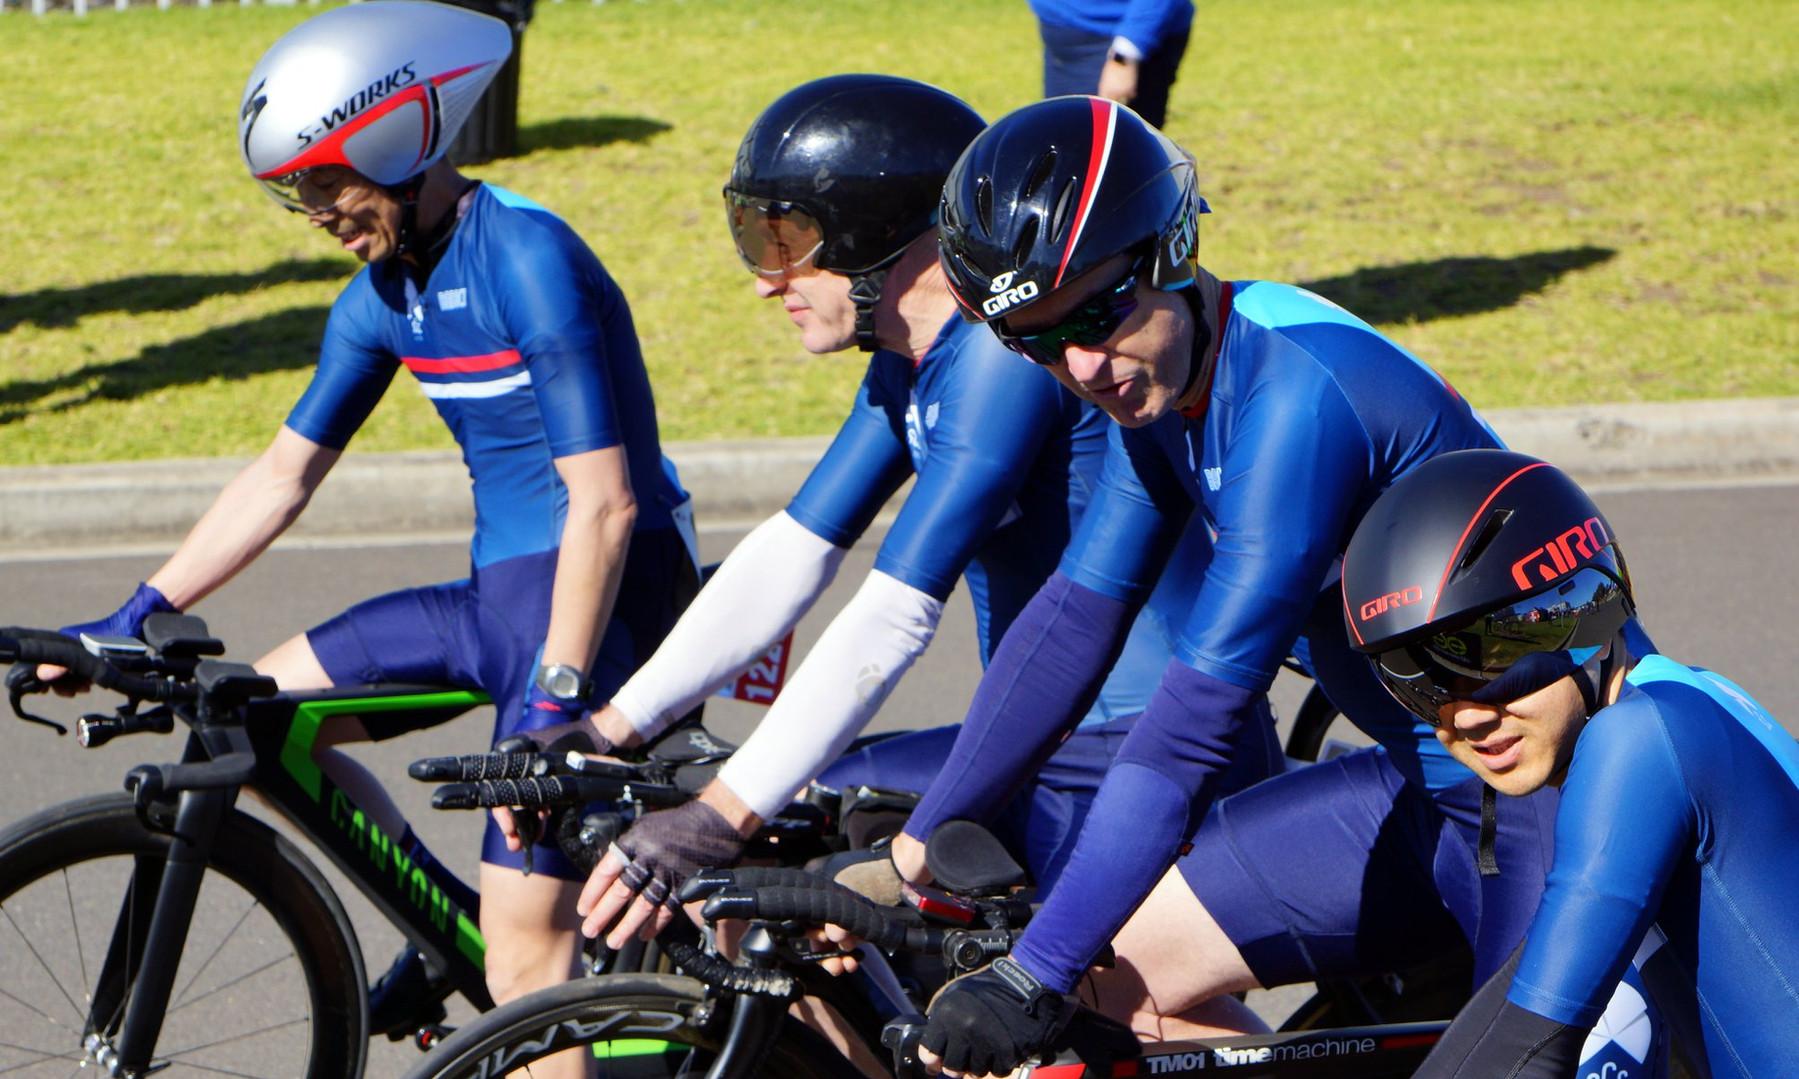 NSW Club Team Trial Championships